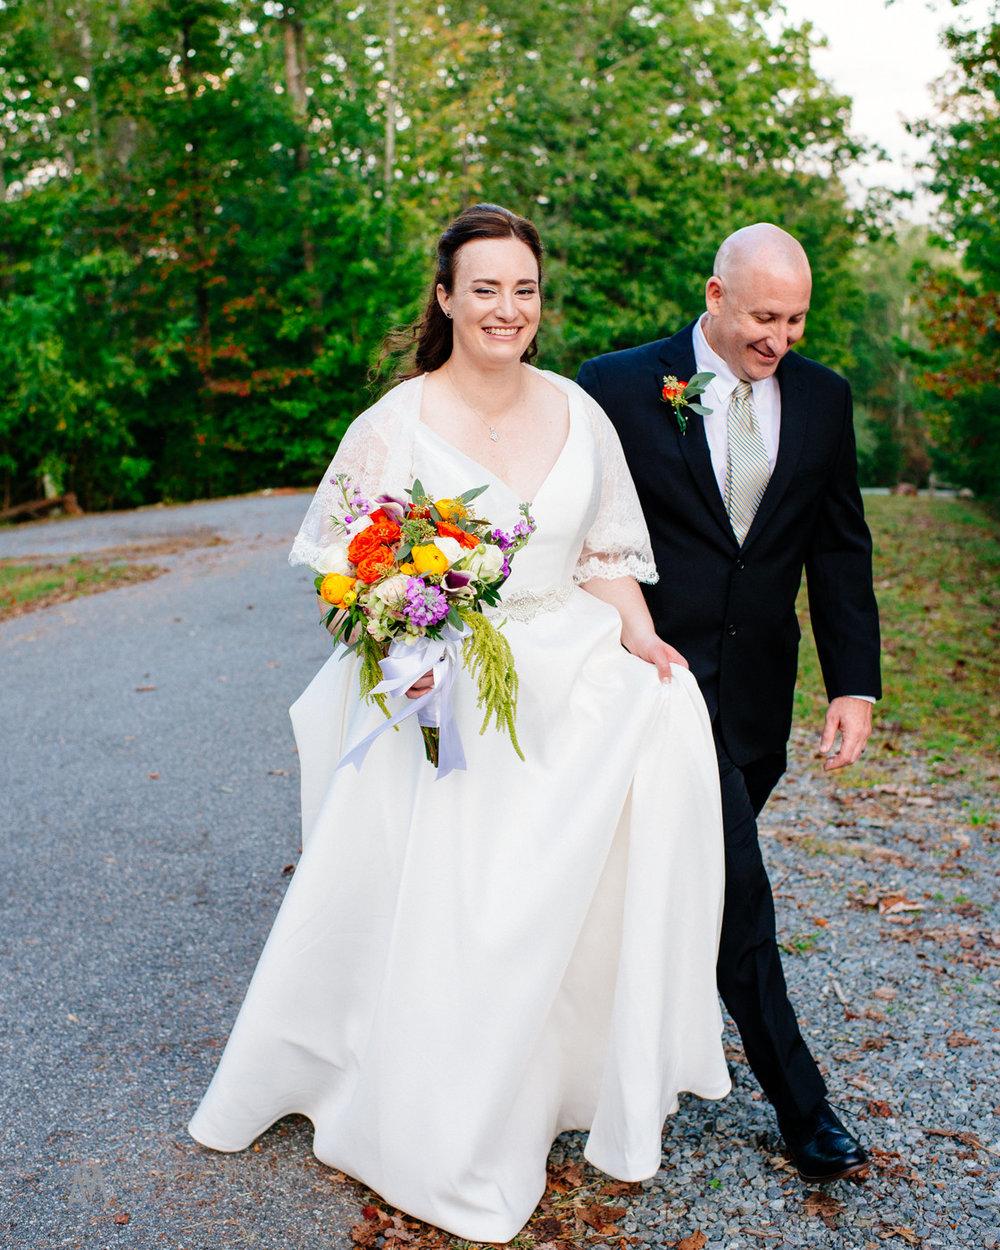 scott-wed-blog-mabry-054-8850.jpg